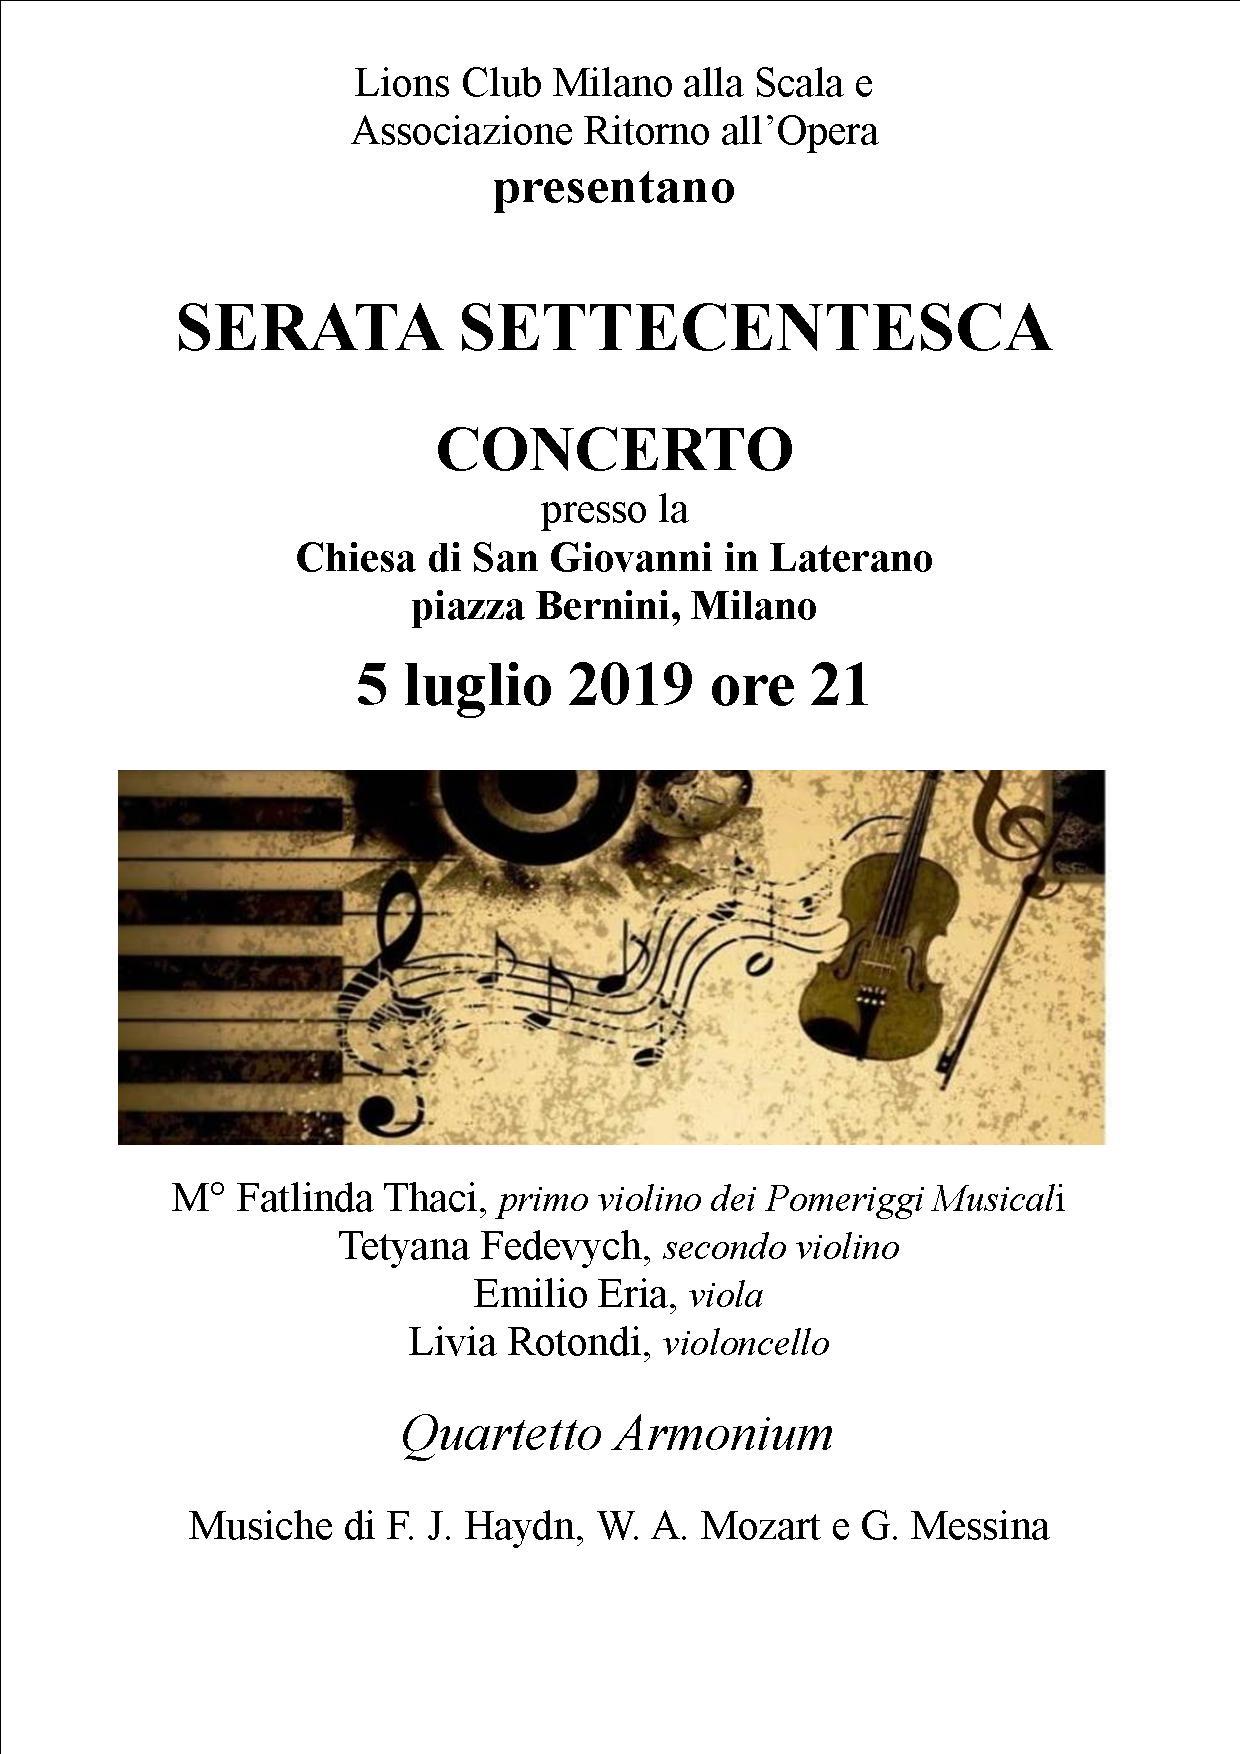 locandina-concerto-05-07-2019